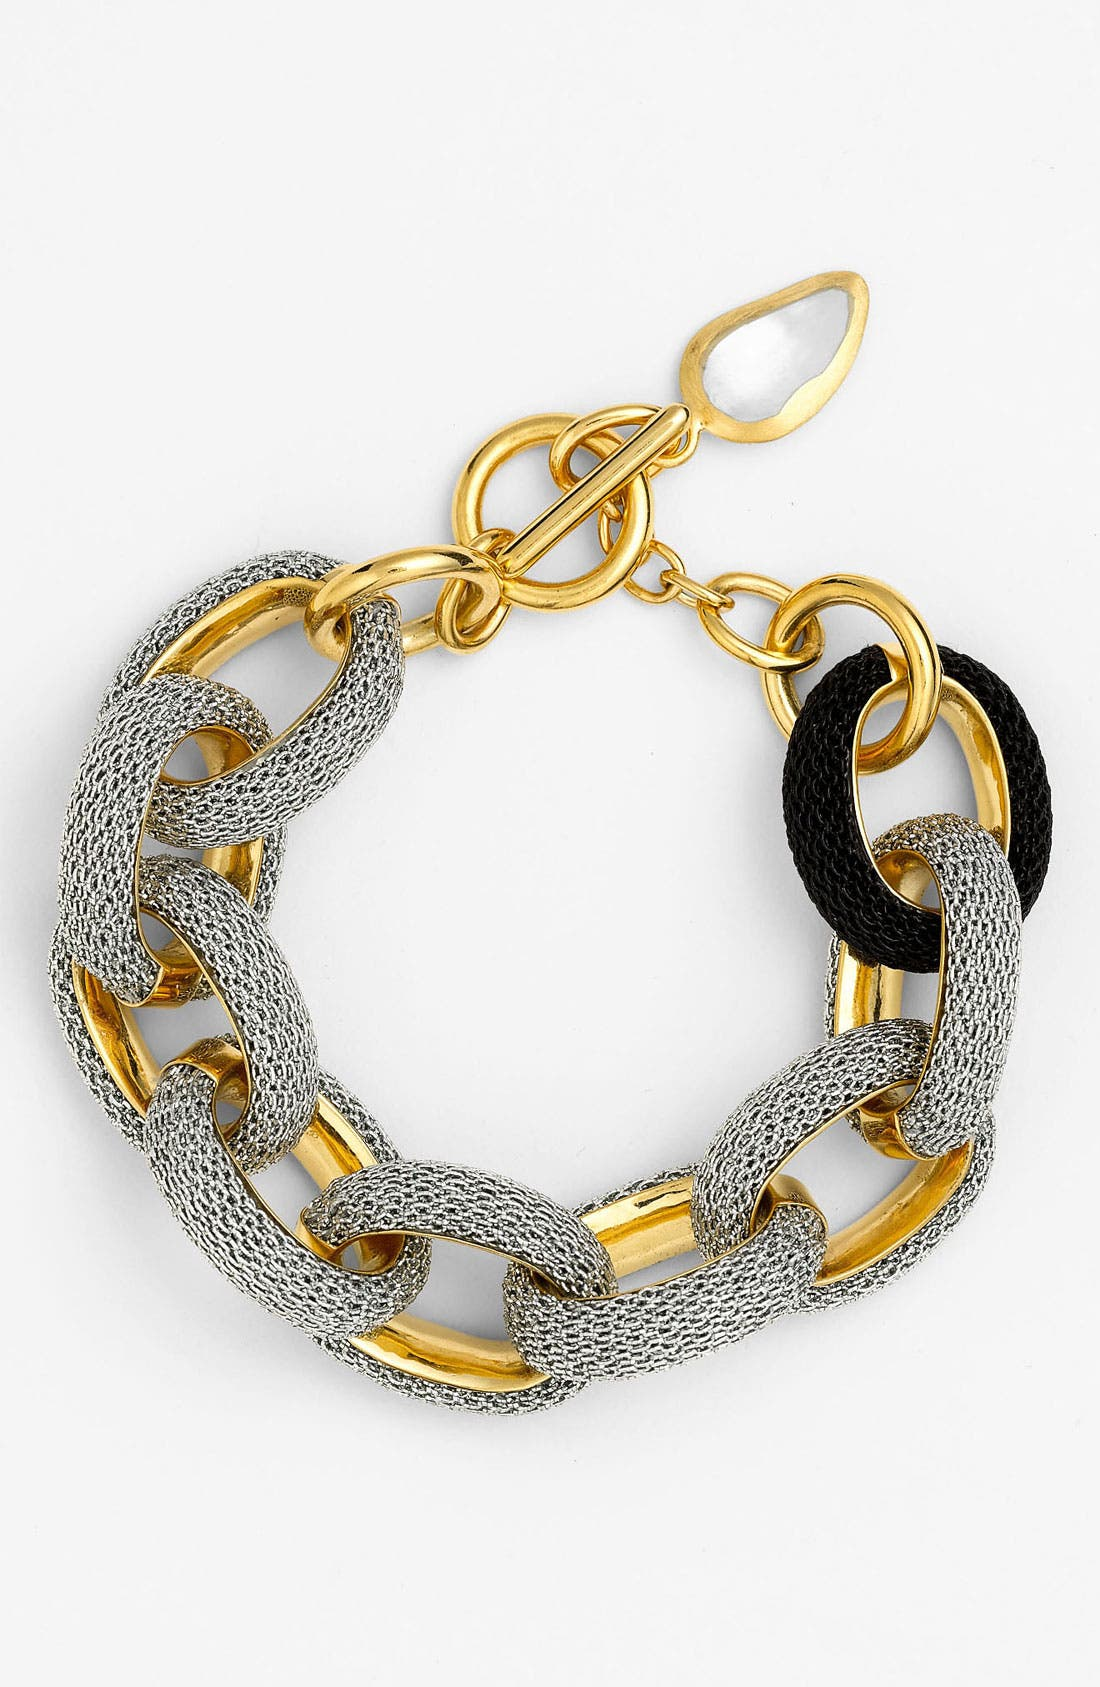 Alternate Image 1 Selected - Adami & Martucci 'Mesh' Link Bracelet (Nordstrom Exclusive)